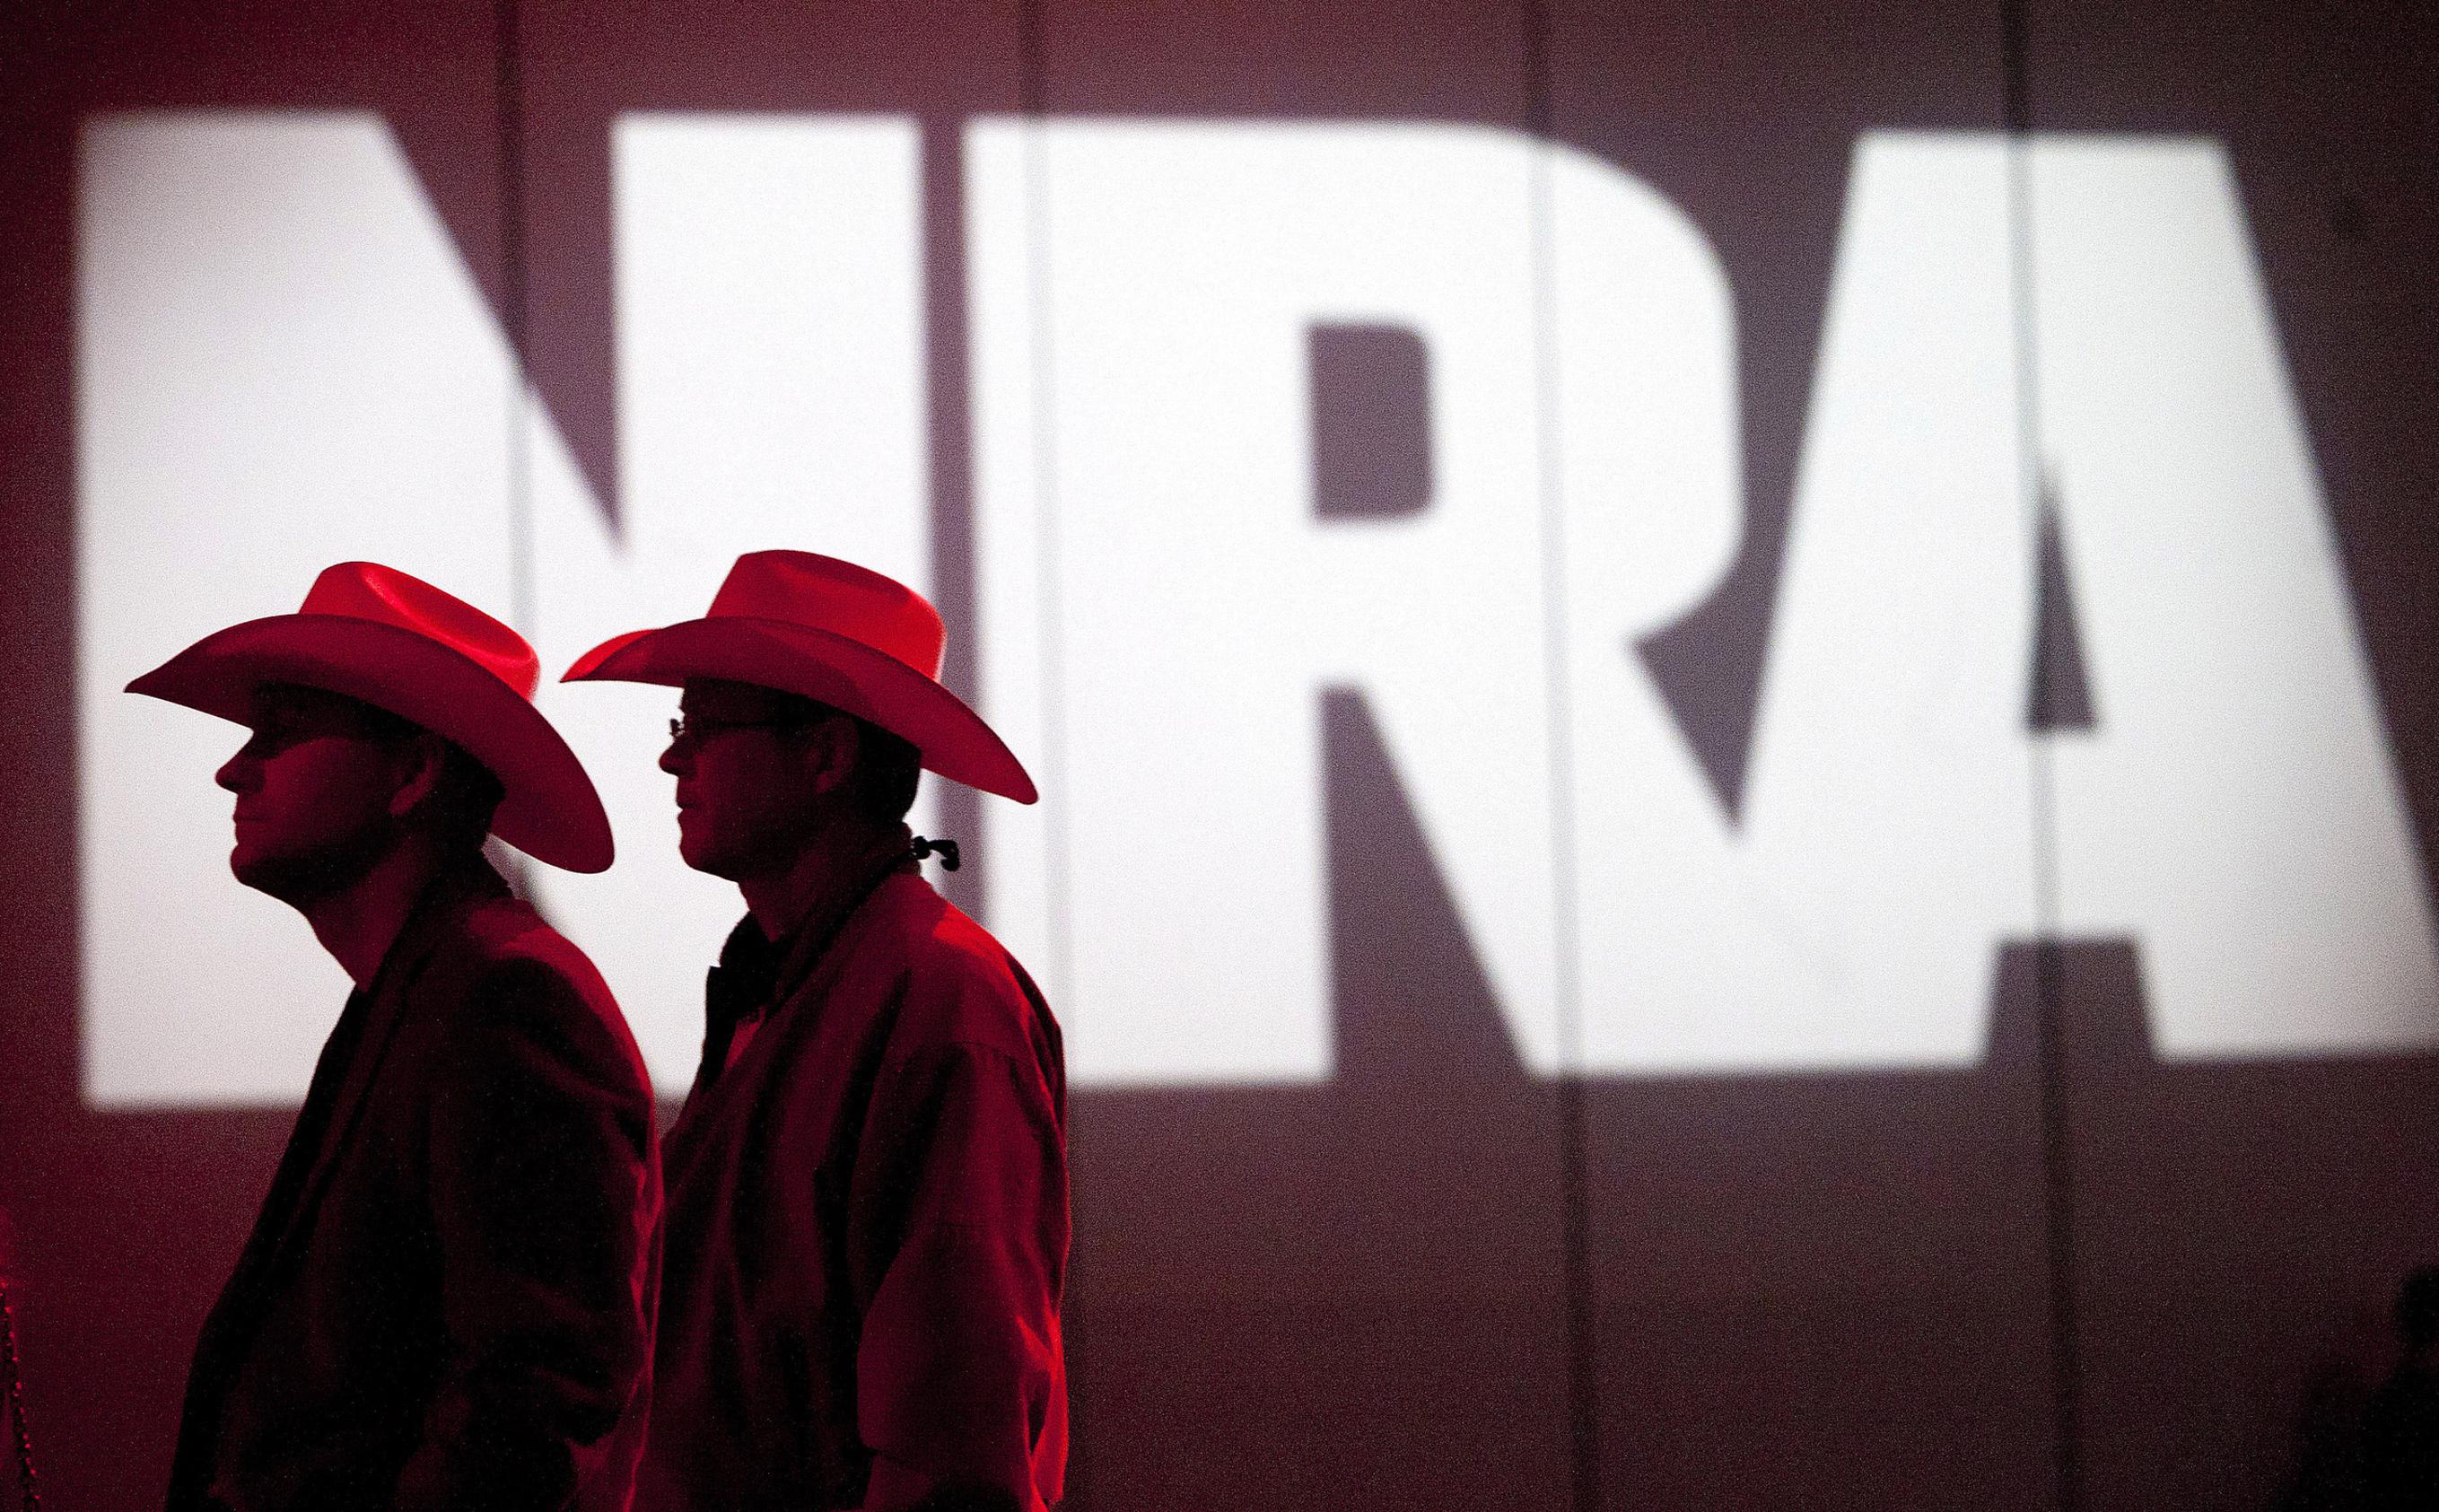 Judge blocks enforcement of LA law that takes aim at NRA